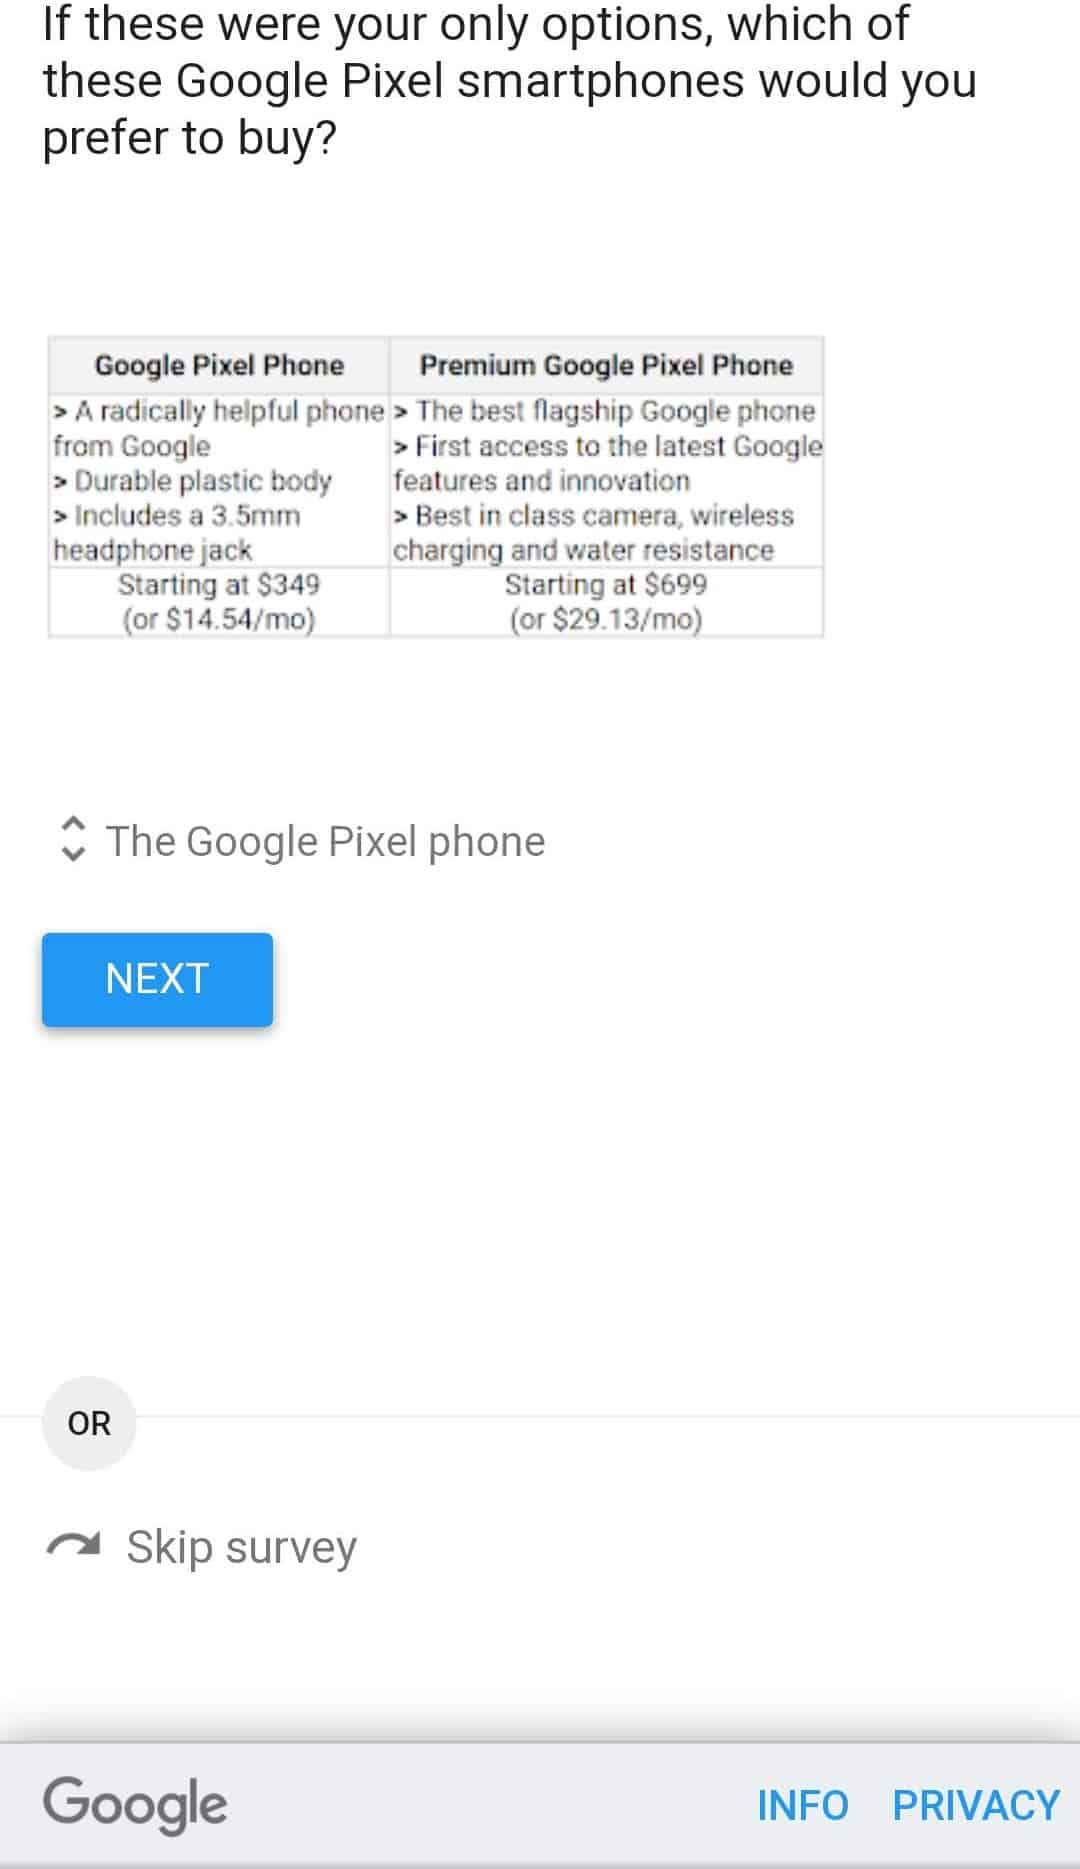 Google Pixel 5 and Google Pixel 4a price leak